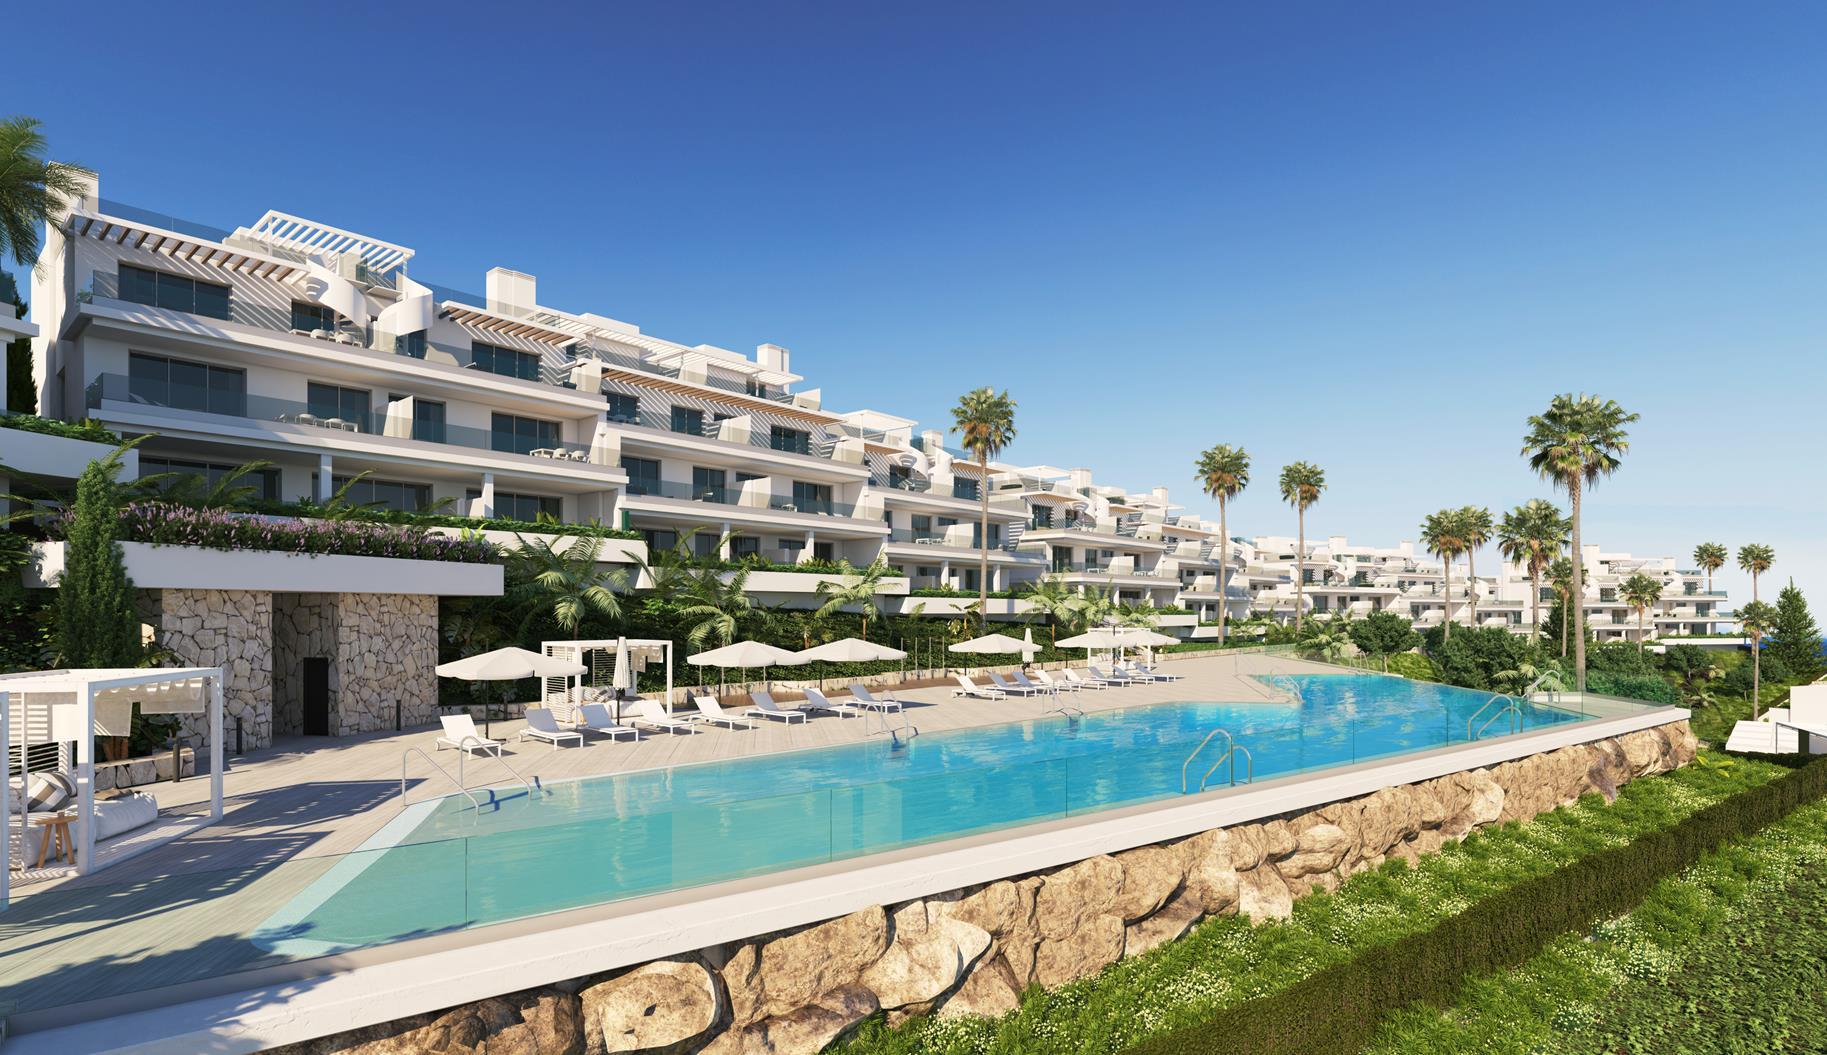 Select contemporary apartments in Cancelada